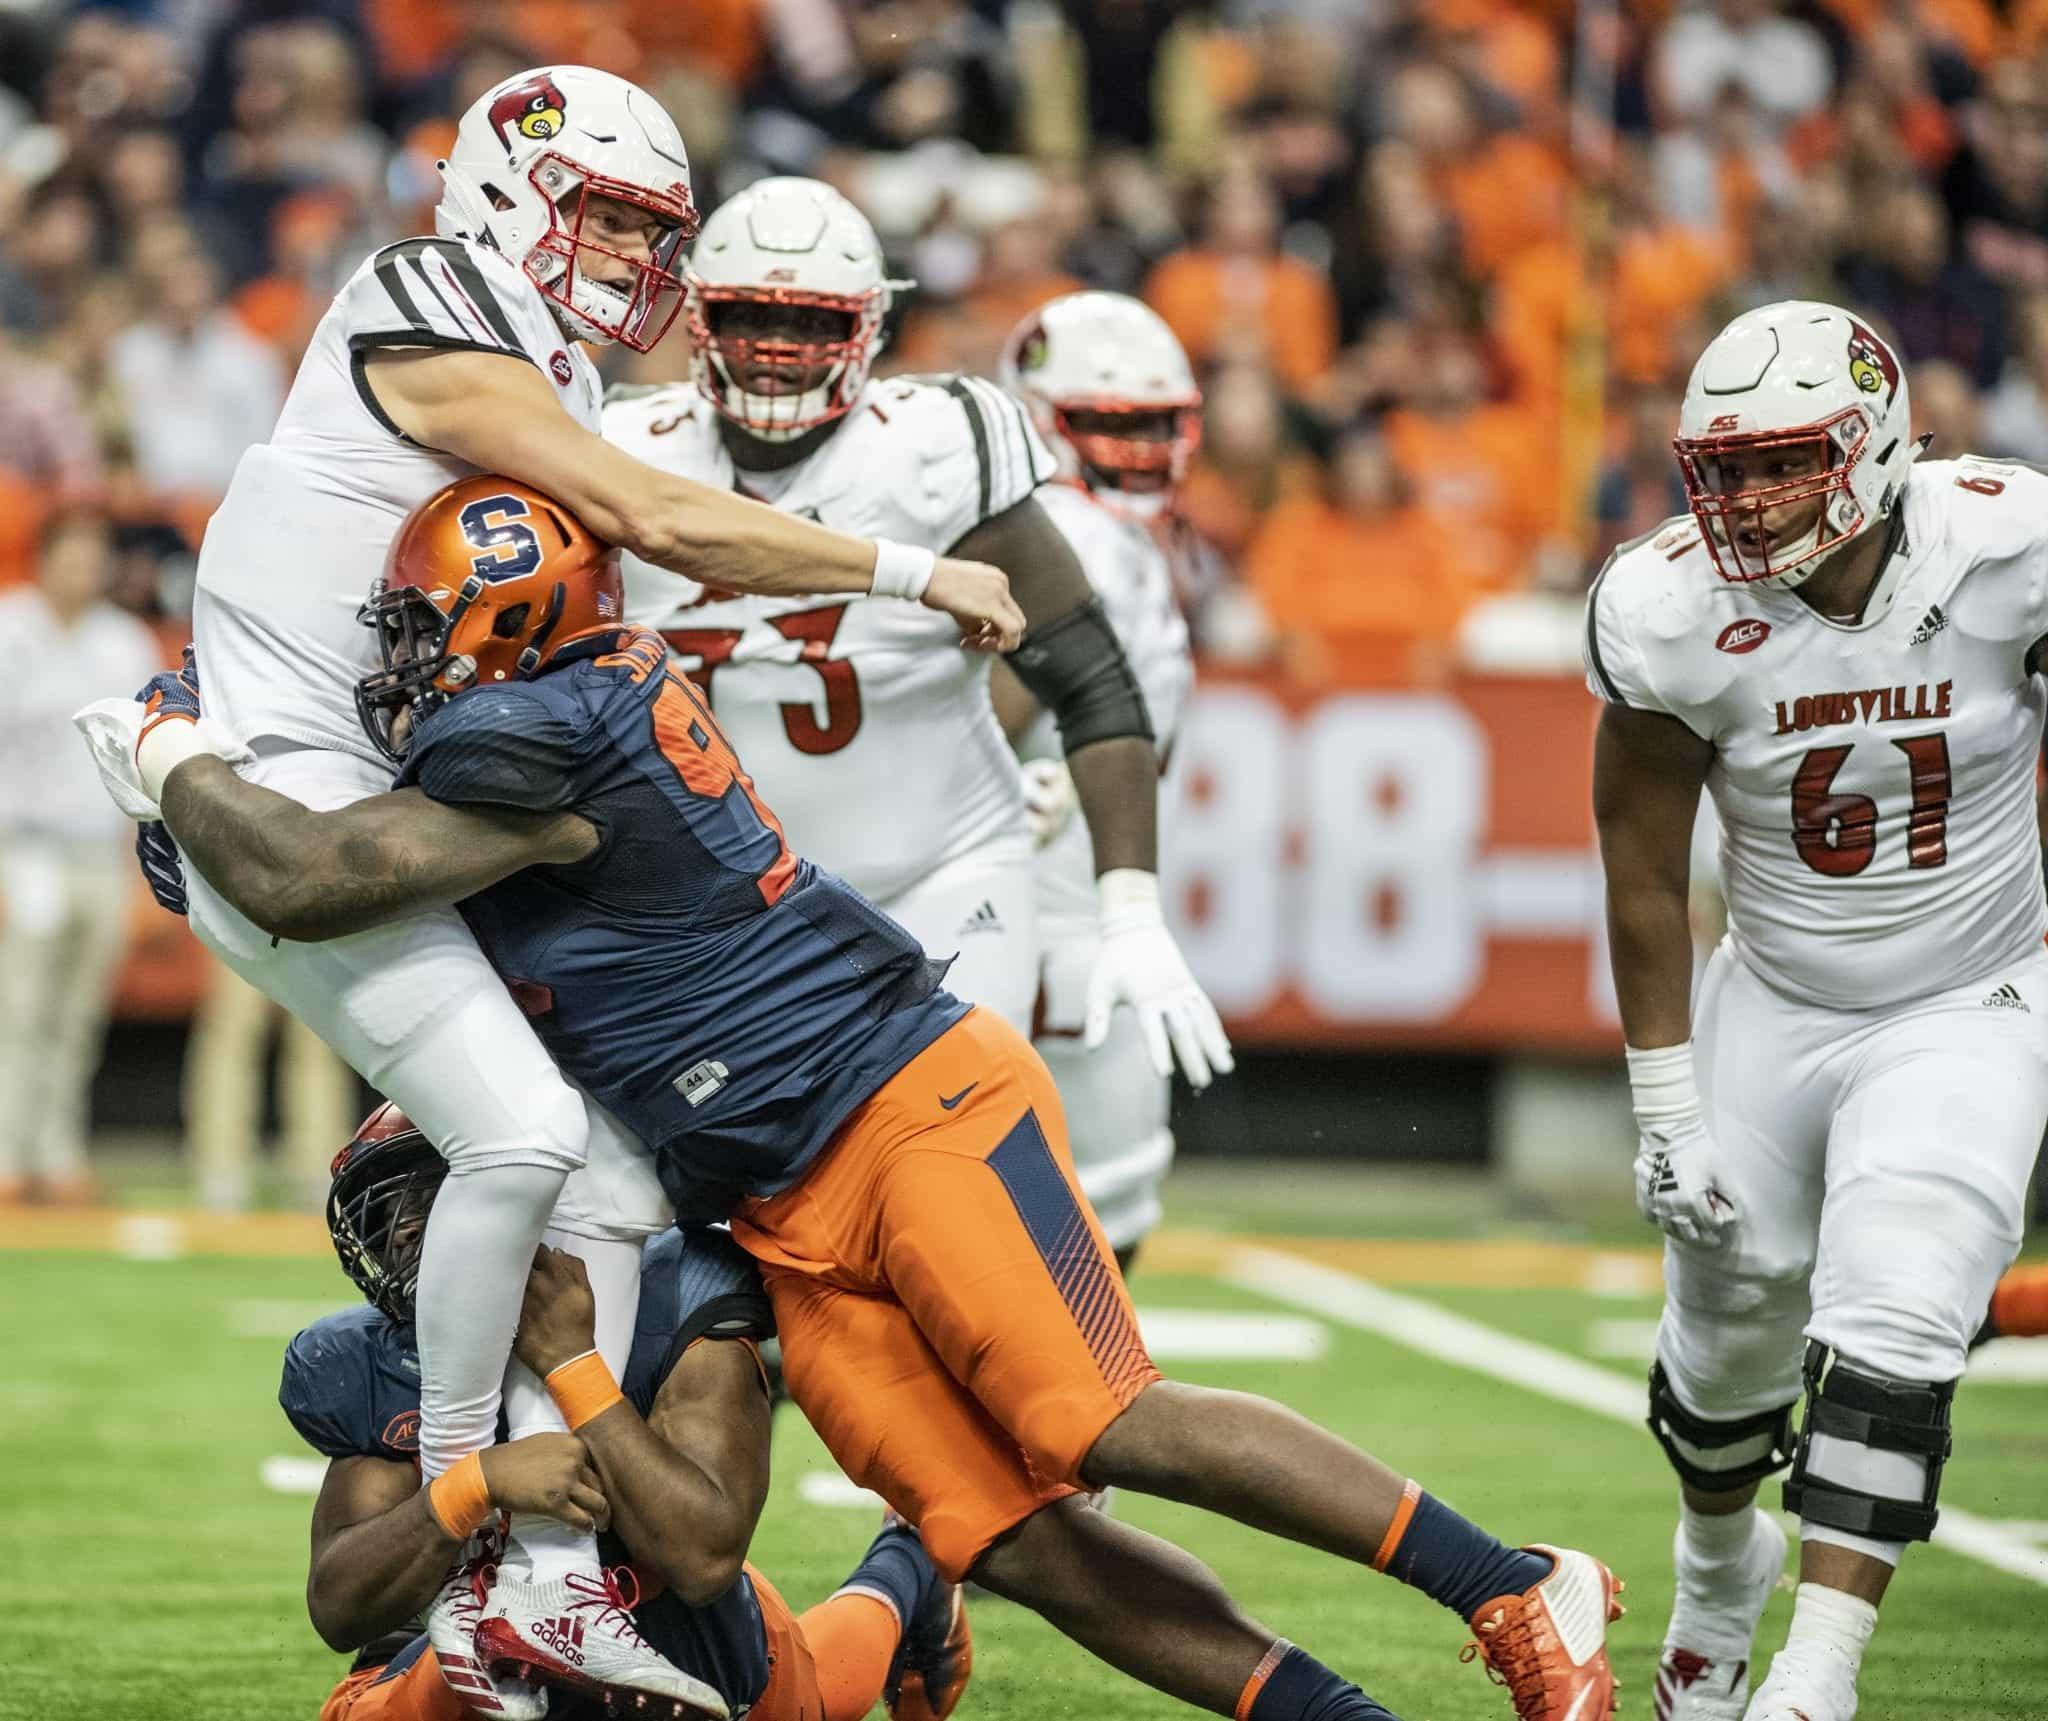 SU vs Louisville: Cardinals quarterback Sean McCormack gets hammered by SU Orange D-linemen Chris Slayton and McKinley Williams